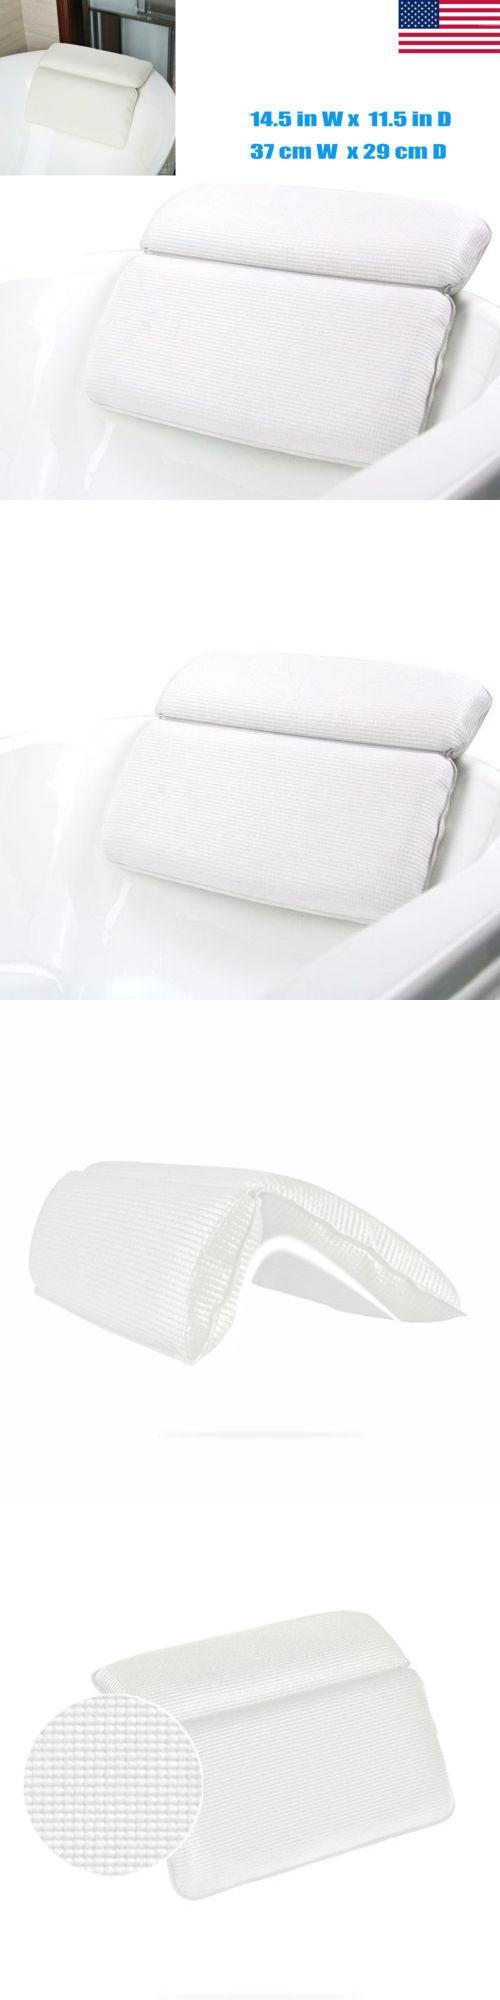 Waterproof bath spa pillow neck back support foam bathtub tub